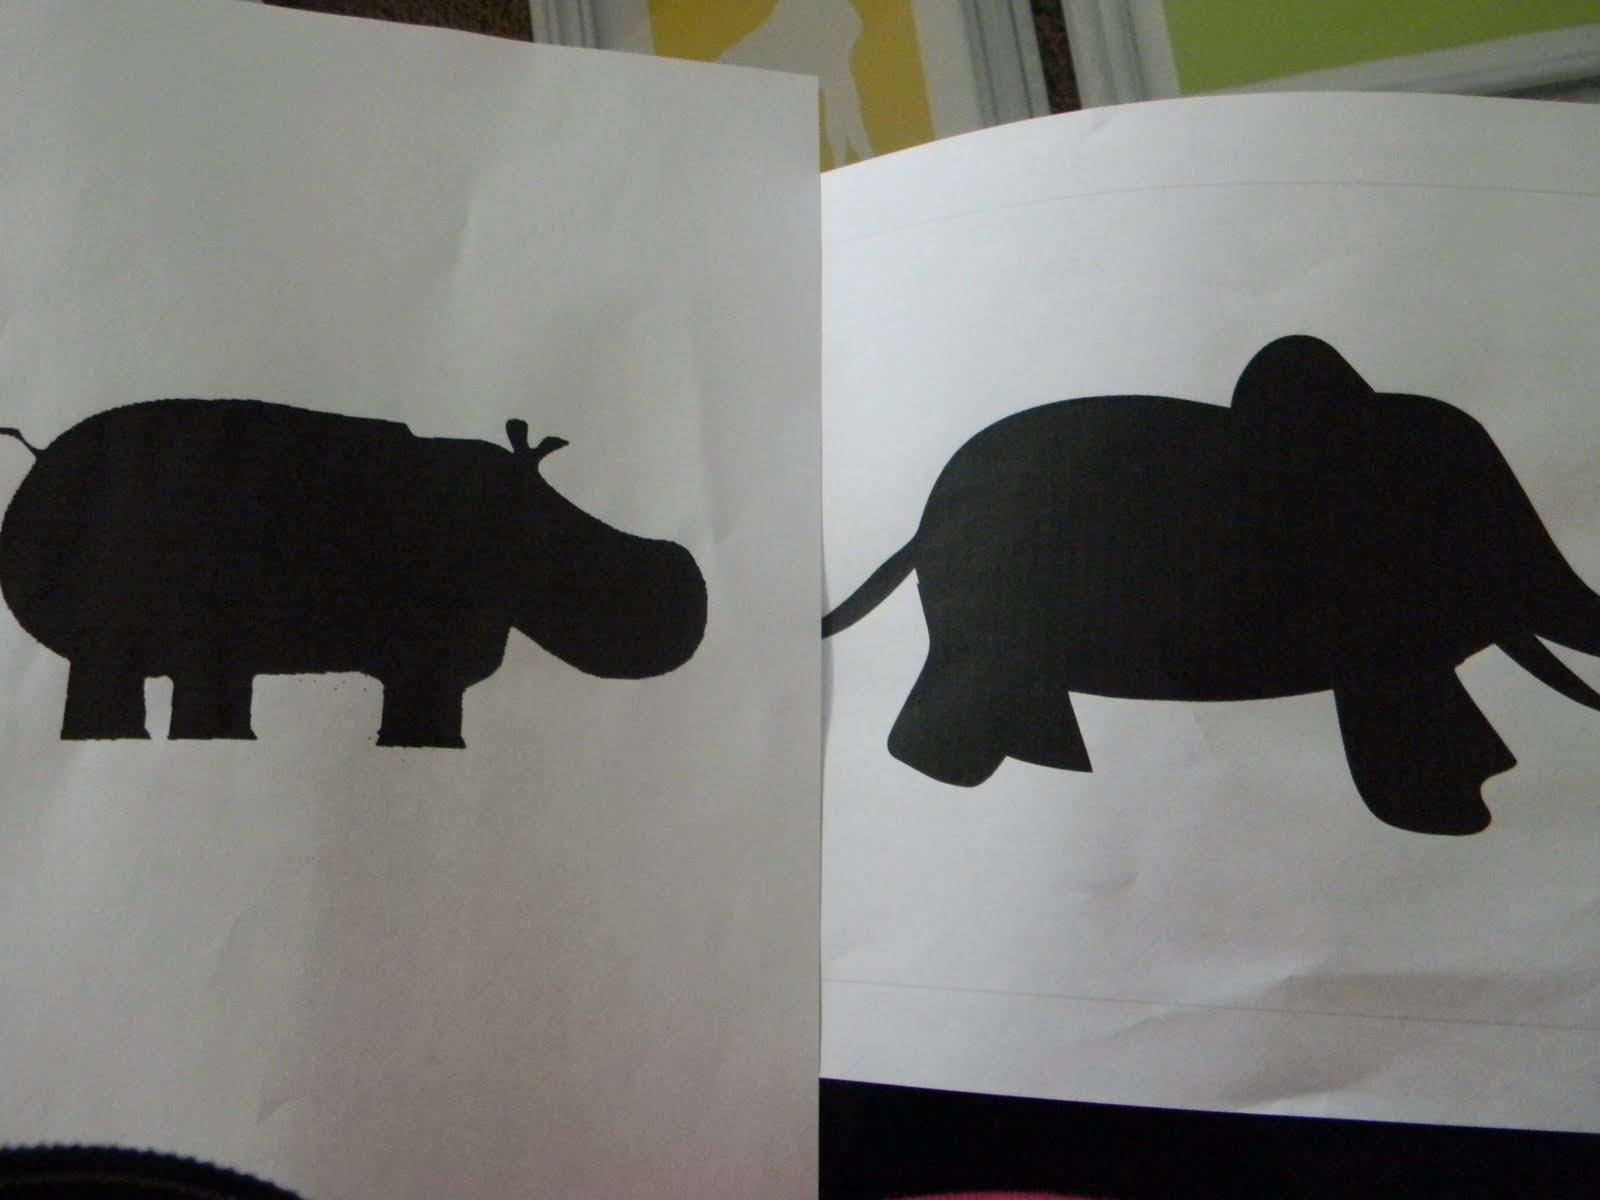 Free Animal Silhouette Clip Art